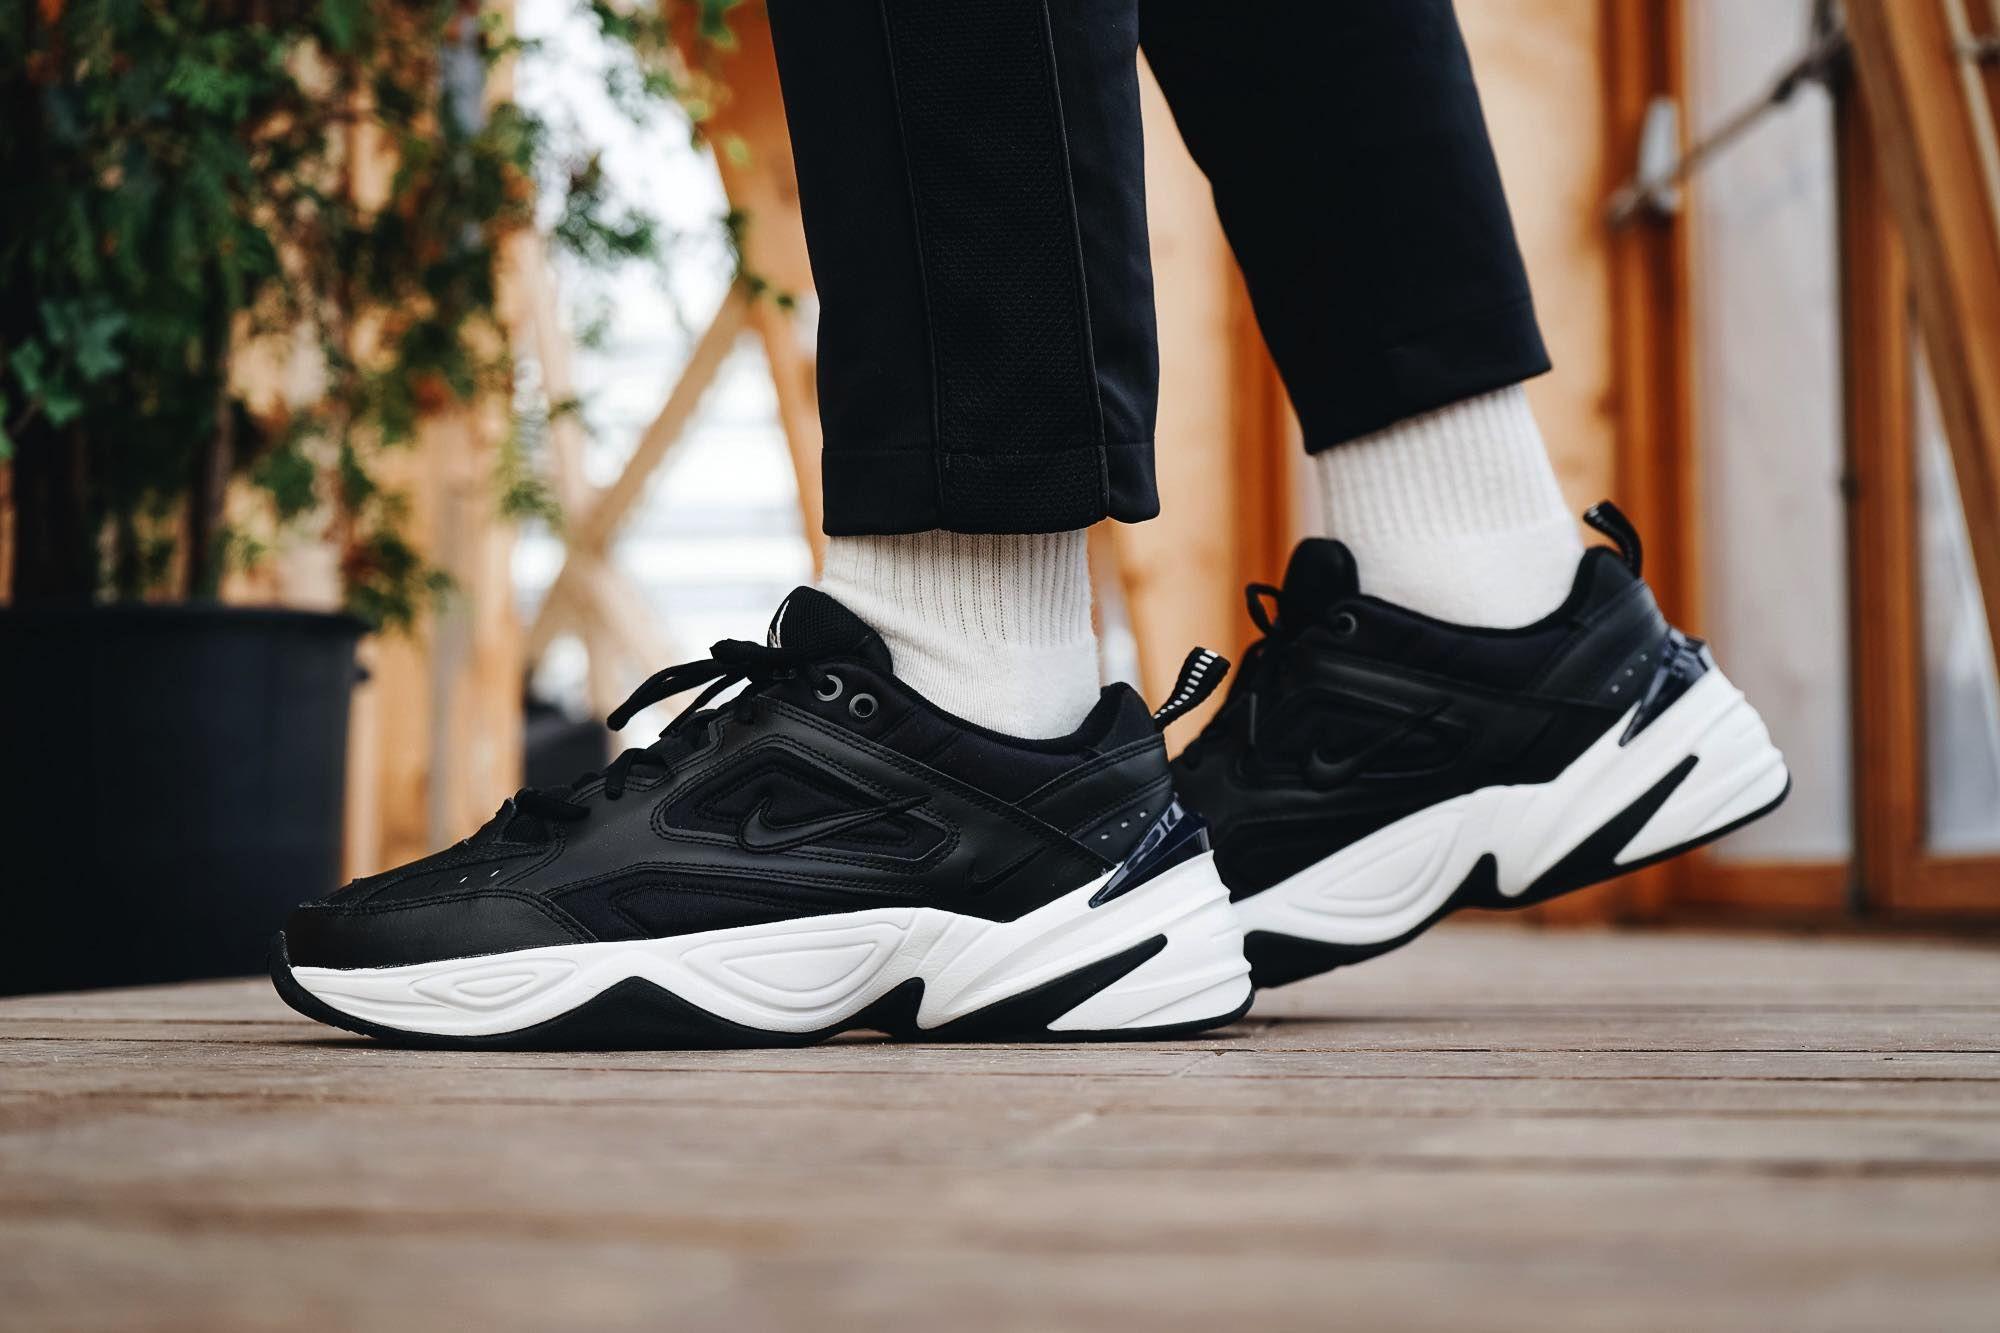 sports shoes 9c1bd 52ab5 Nike M2K Tekno Black White On Feet